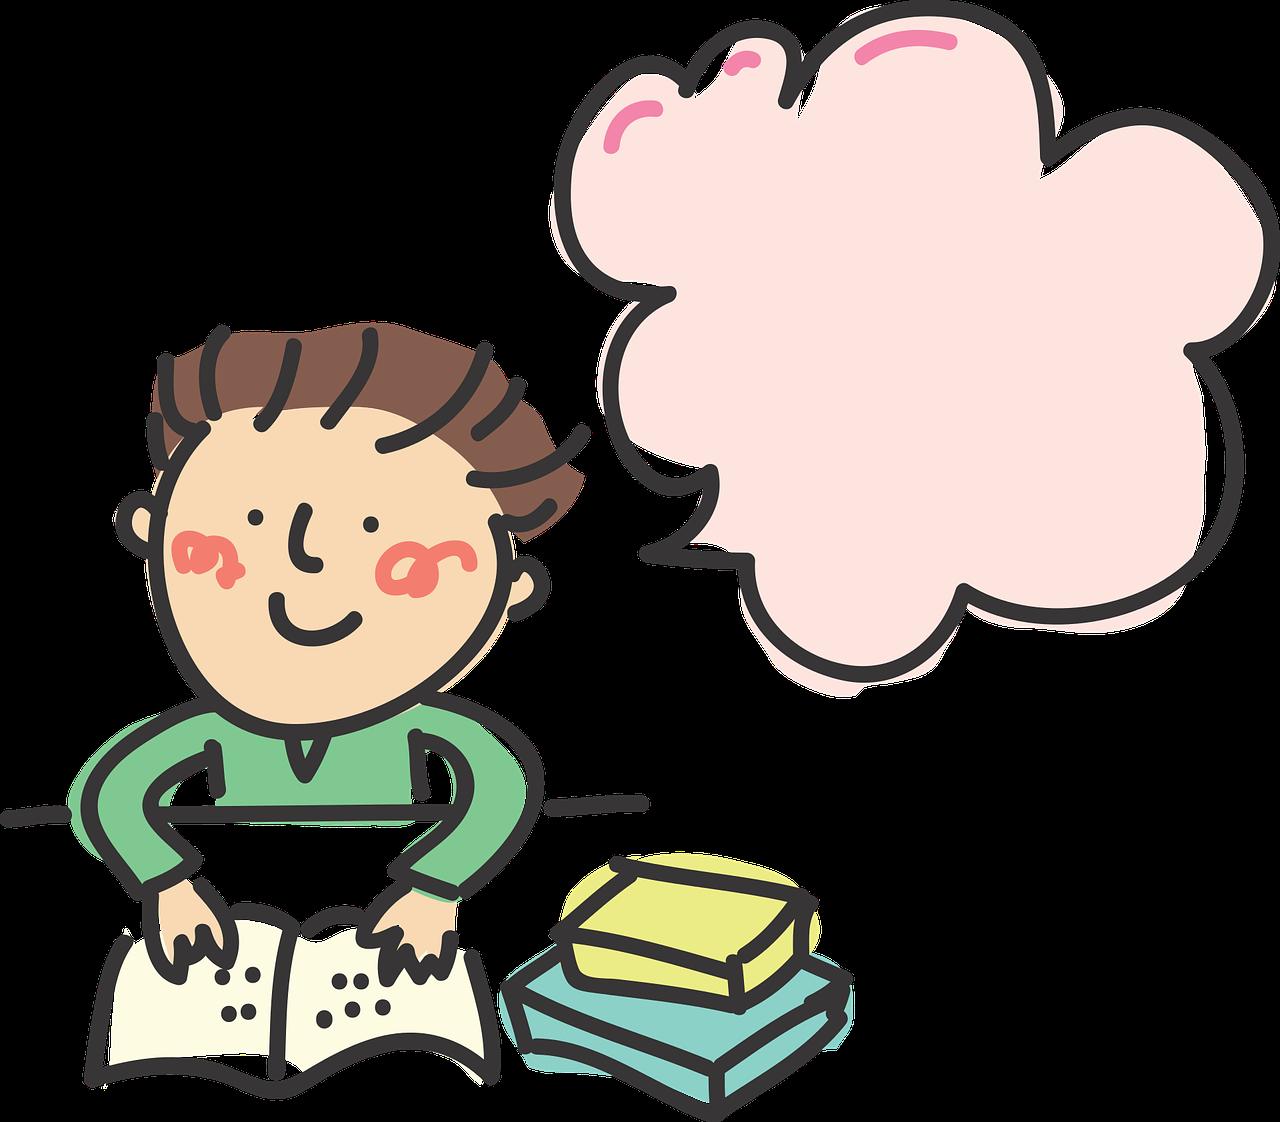 Vyondを最速独学で勉強するための3つの方法【オンライン講座で勉強しましょう】